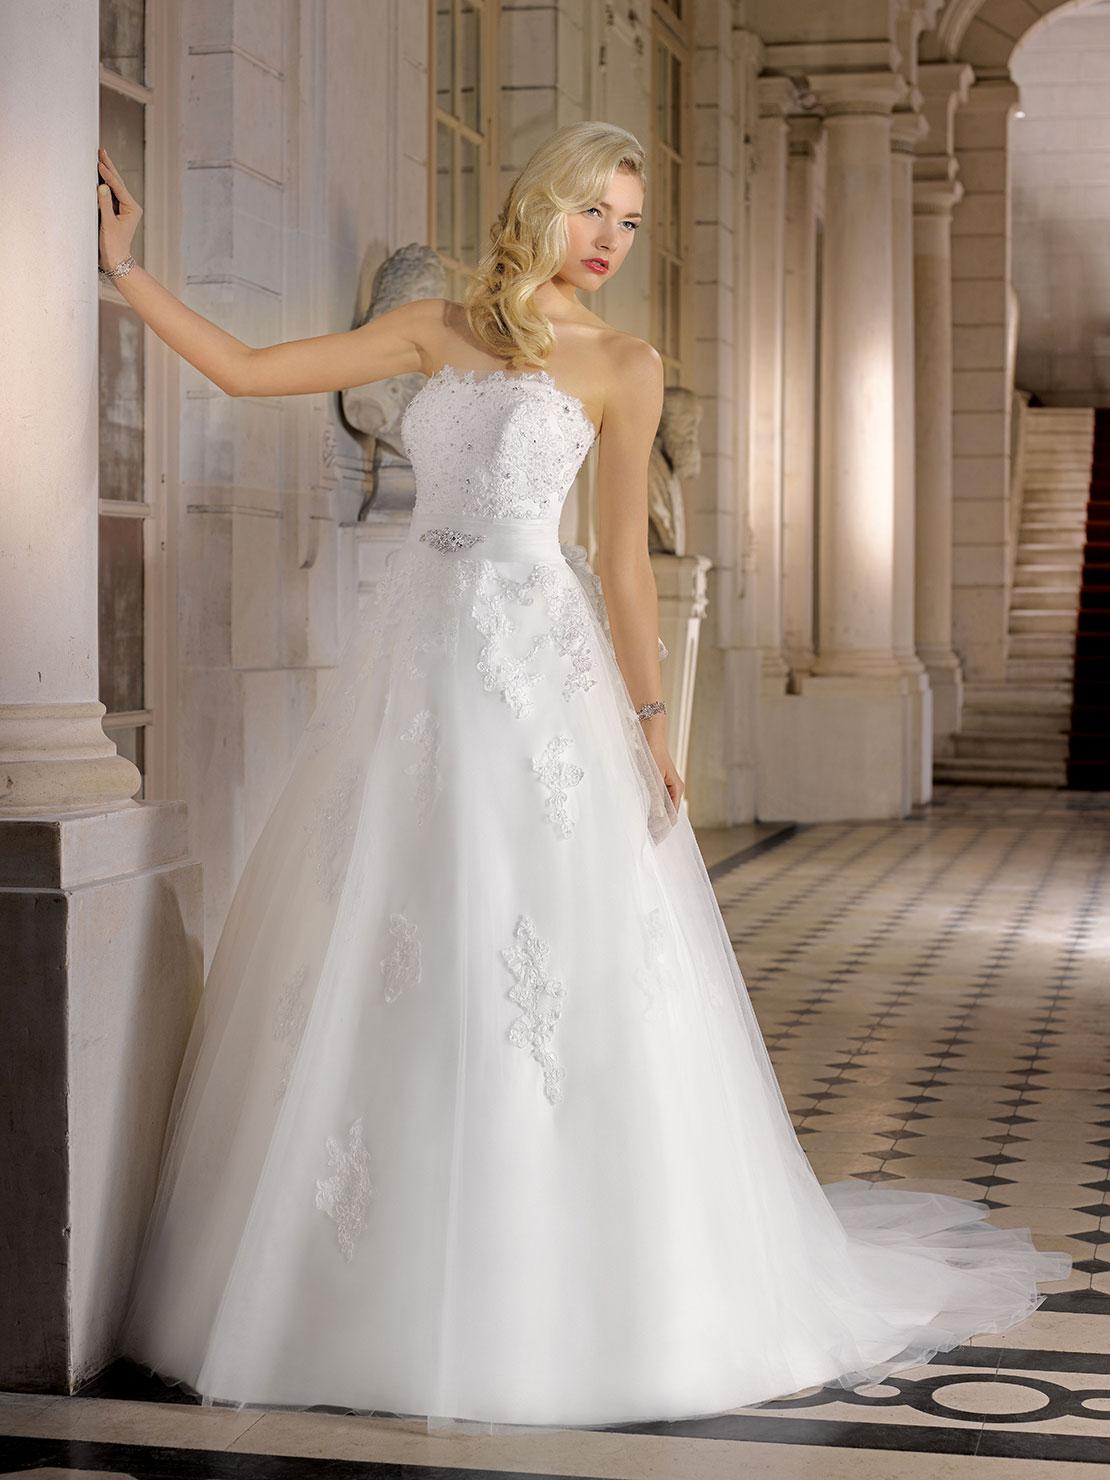 Famous Princess Kelly Wedding Dress Vignette - Wedding Dress Ideas ...